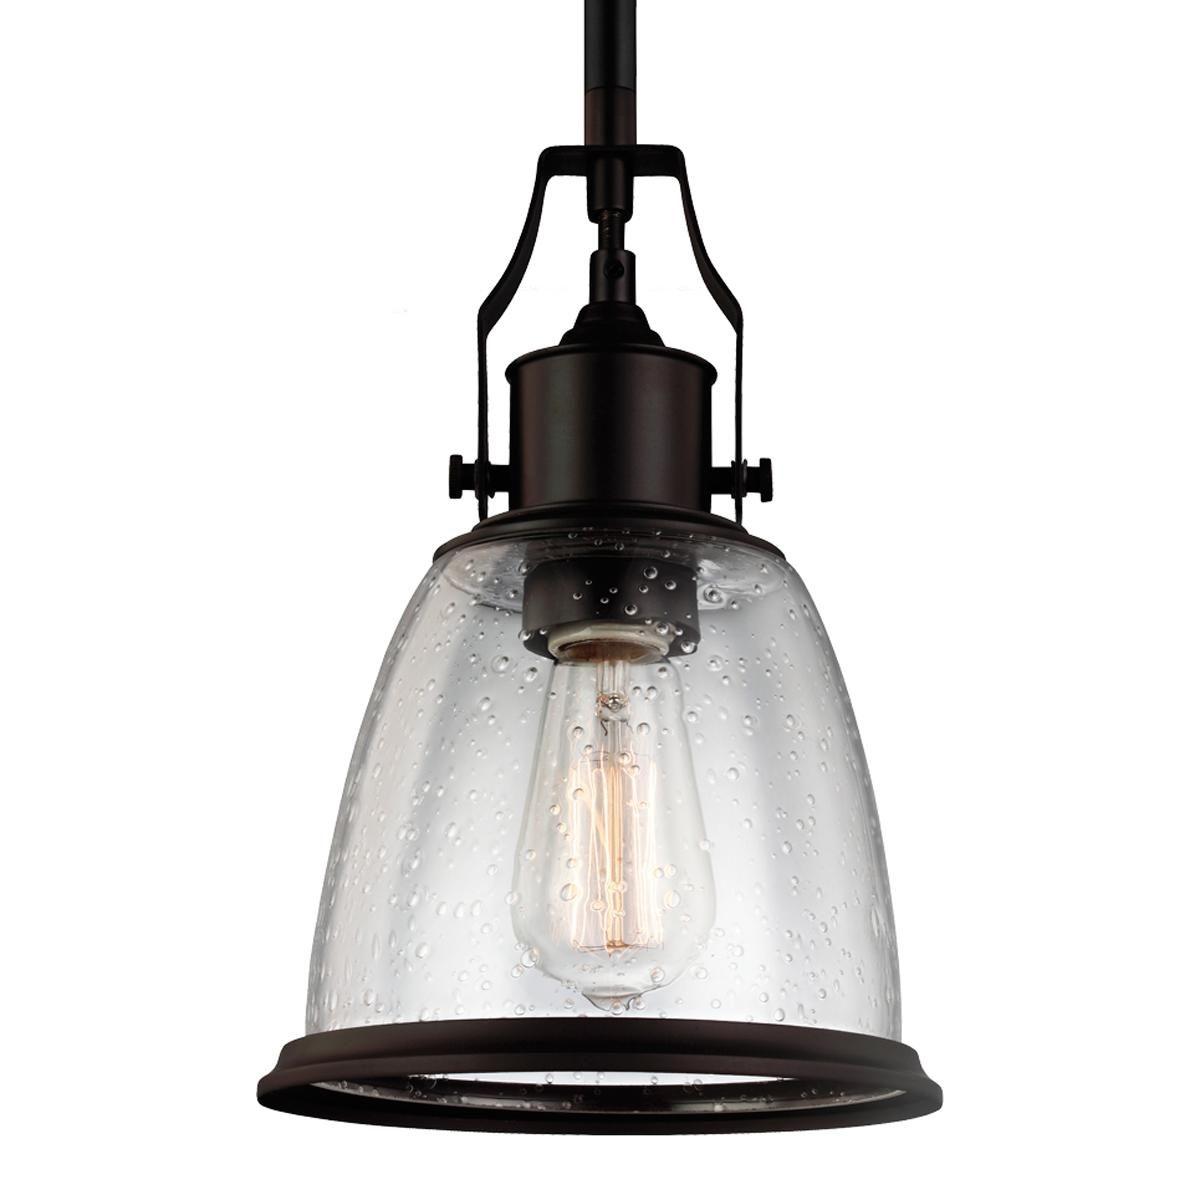 classic pendant lighting. $169 7.5d classic bell shade pendant - small lighting n